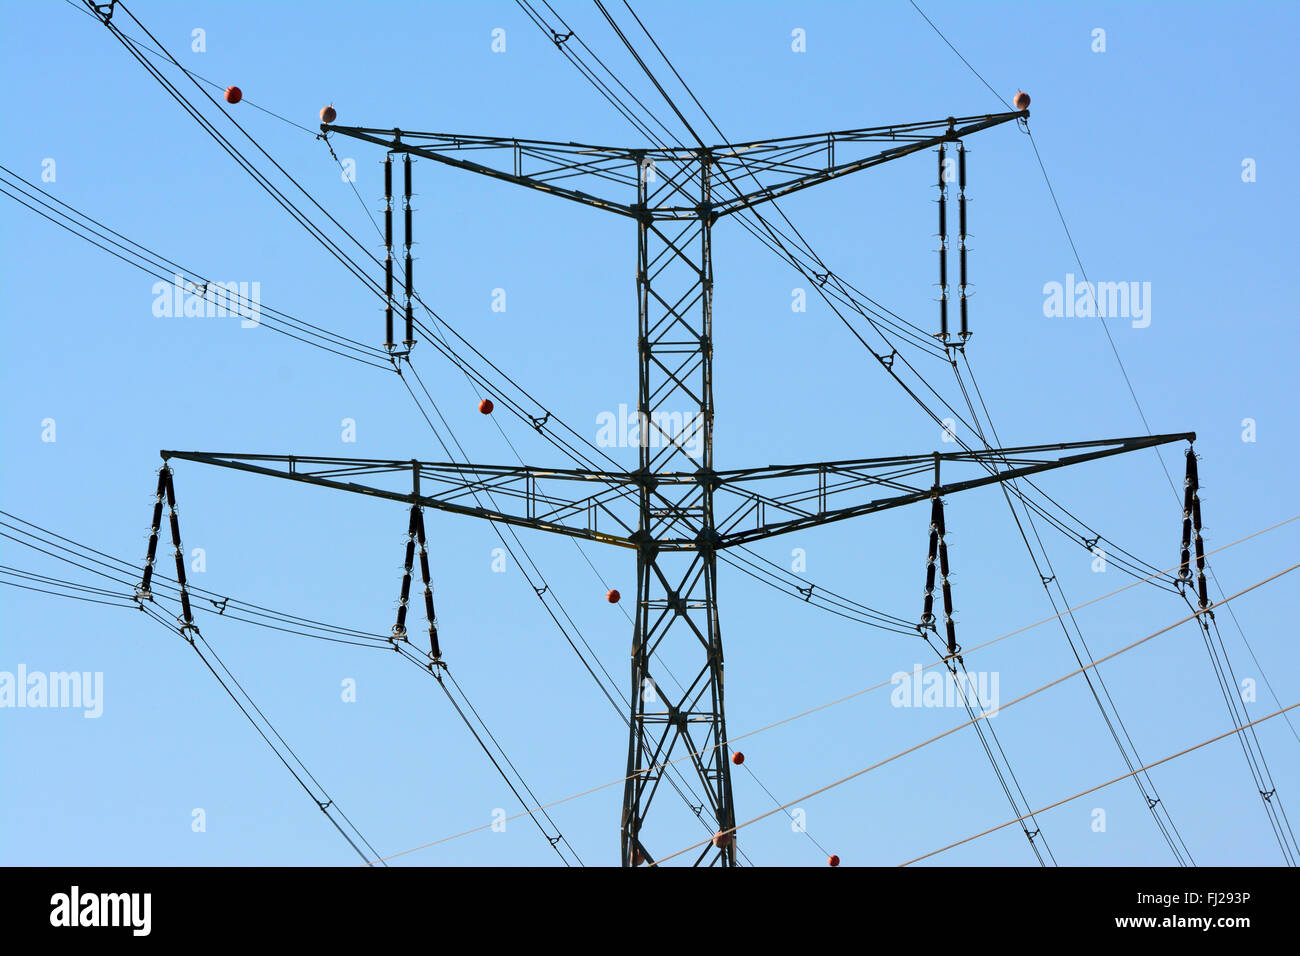 High voltage electricity pylon closeup - Stock Image